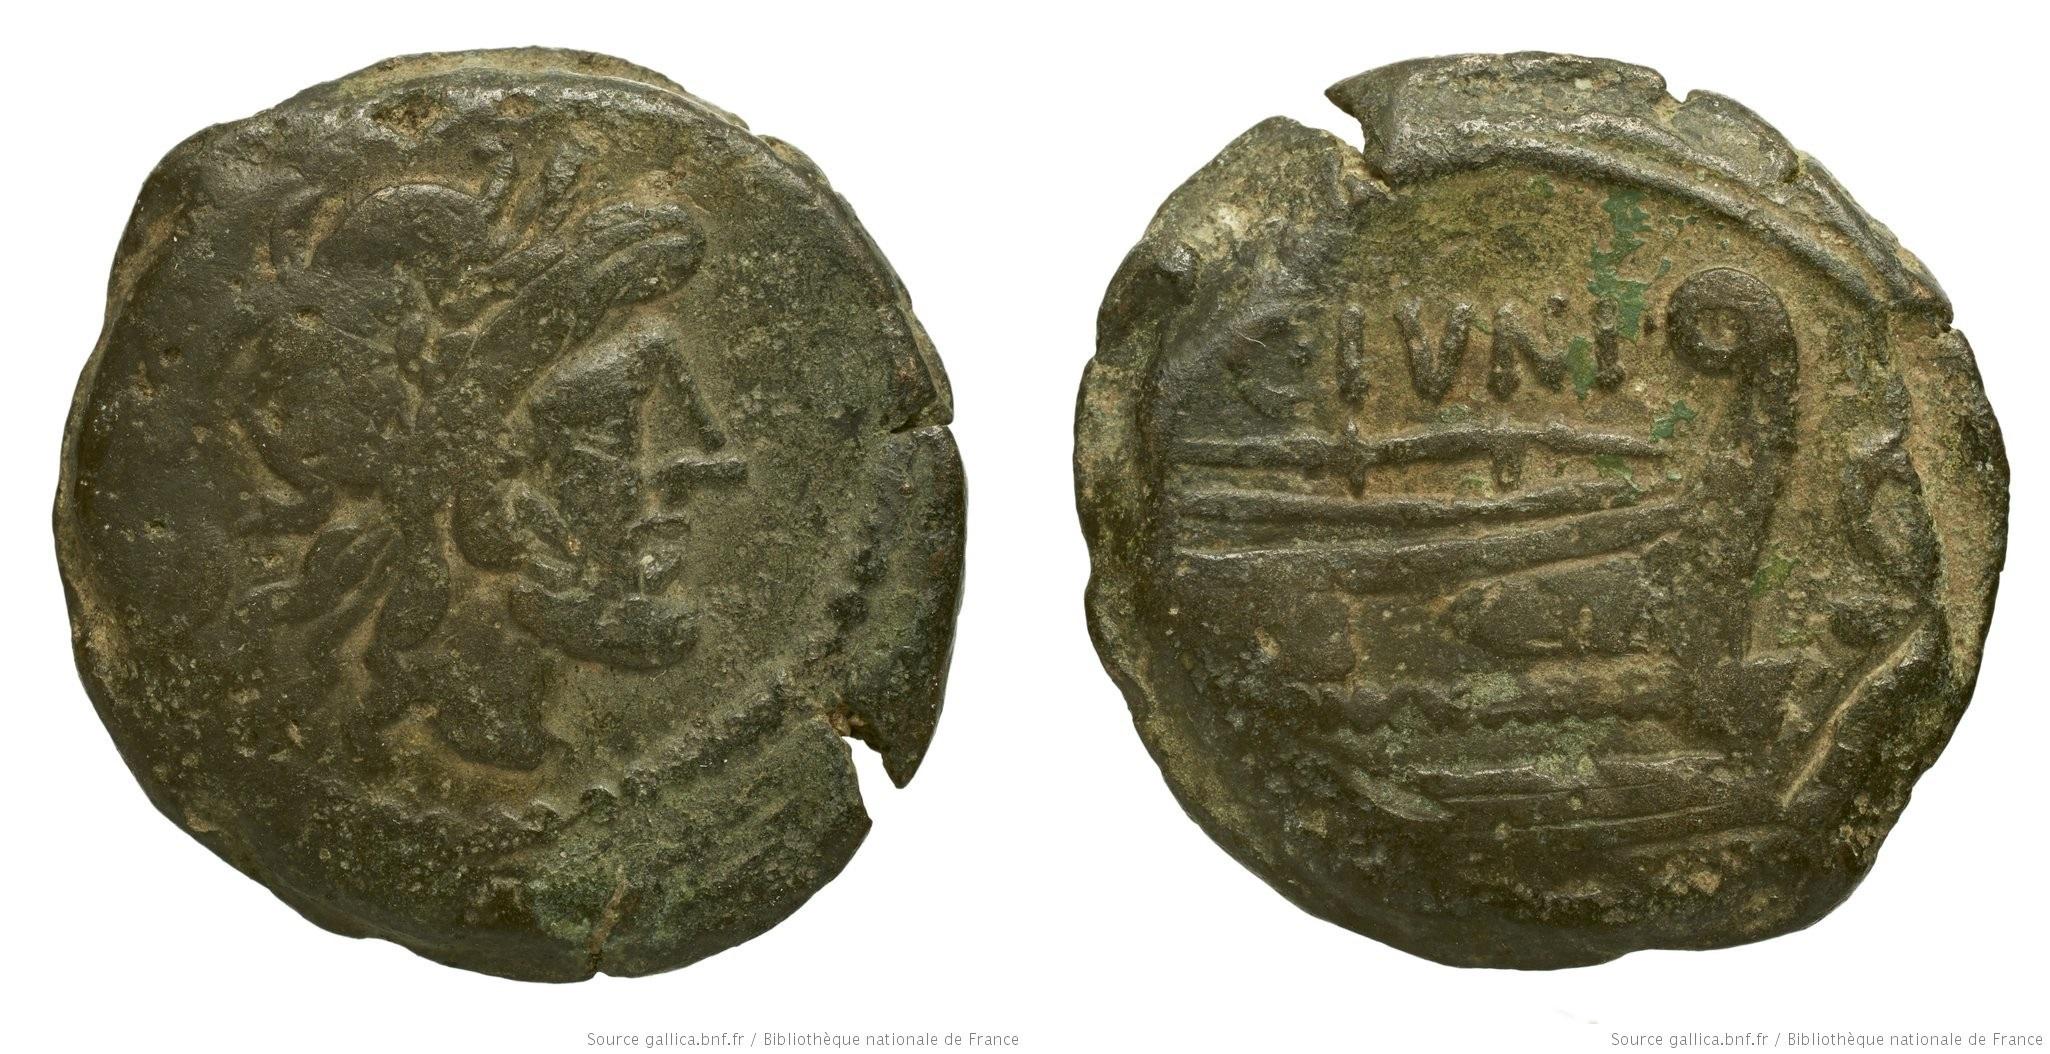 852JU – Semis Junia – Caius Junius